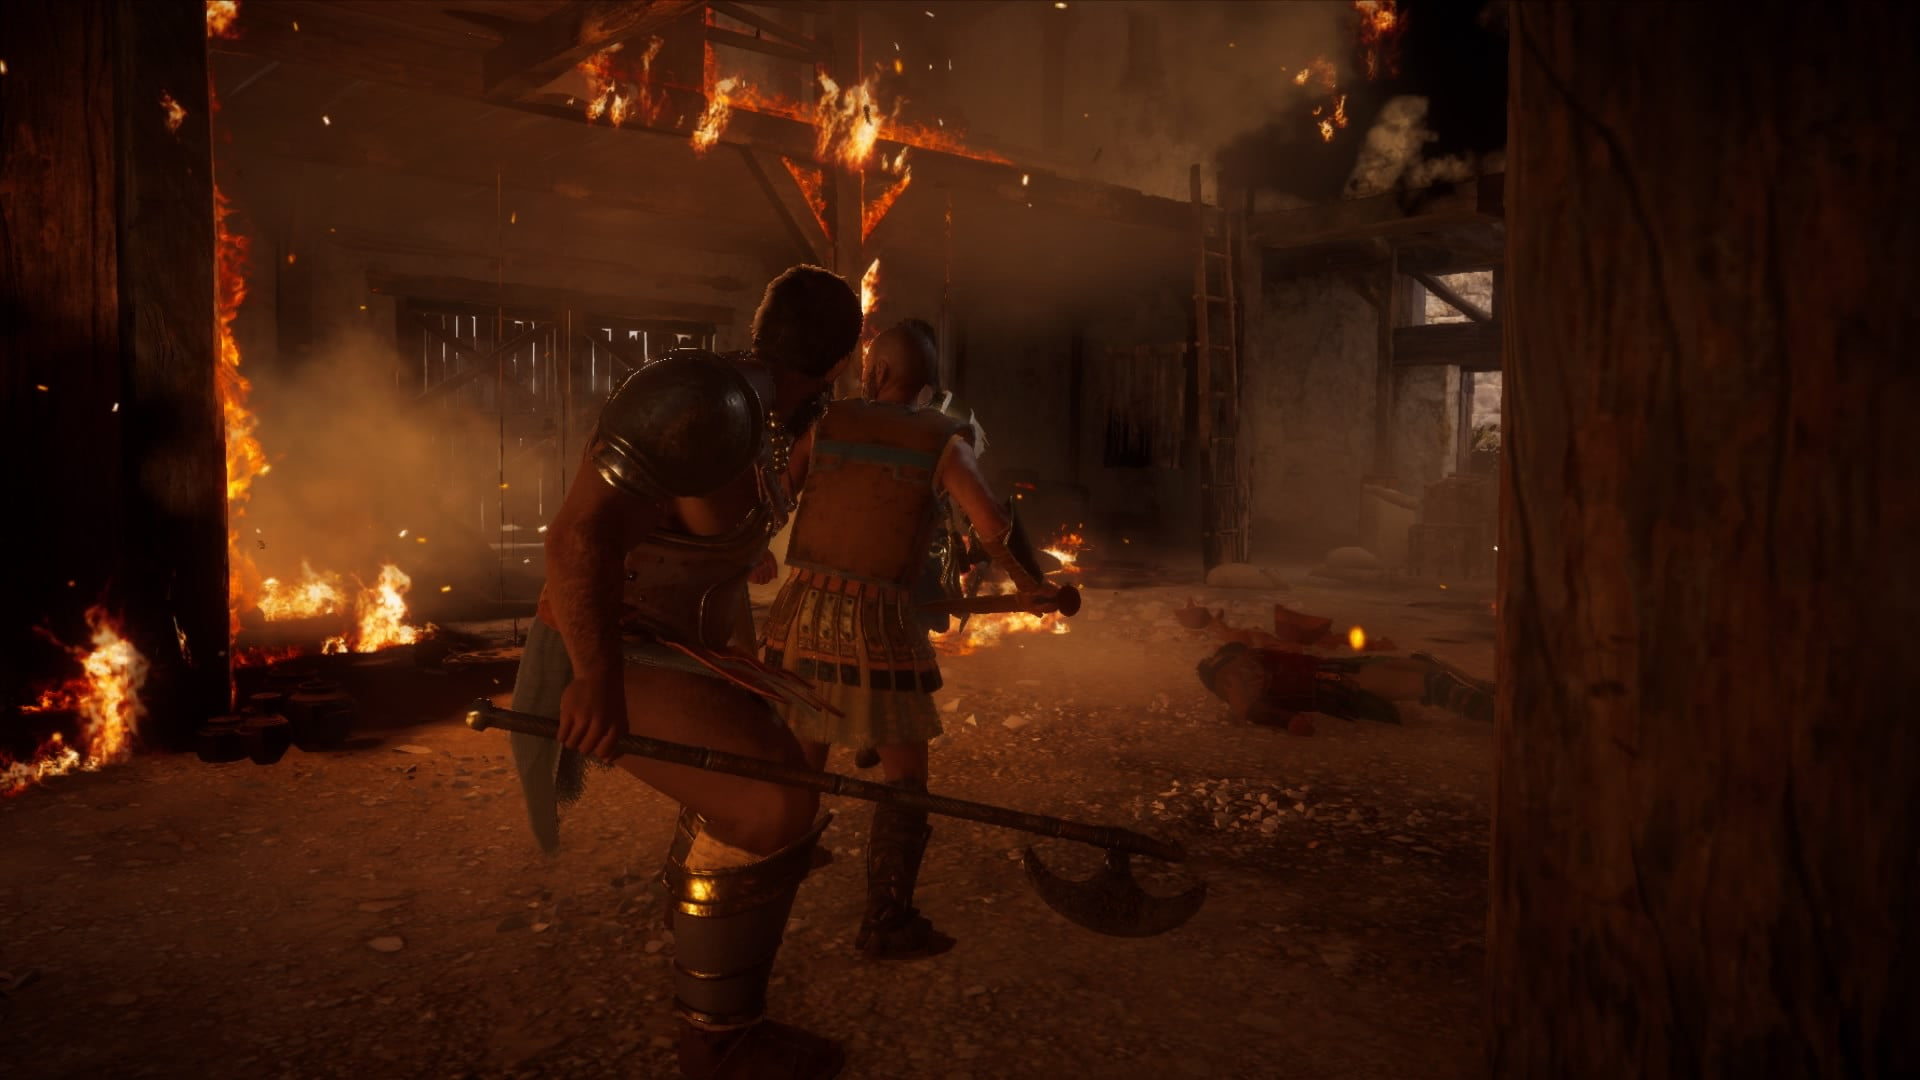 assassins creed odyssey review 29625 1920x1080 - نمرات Assassin's Creed Odyssey منتشر شد؛ بهترین اساسینز کرید سالهای اخیر